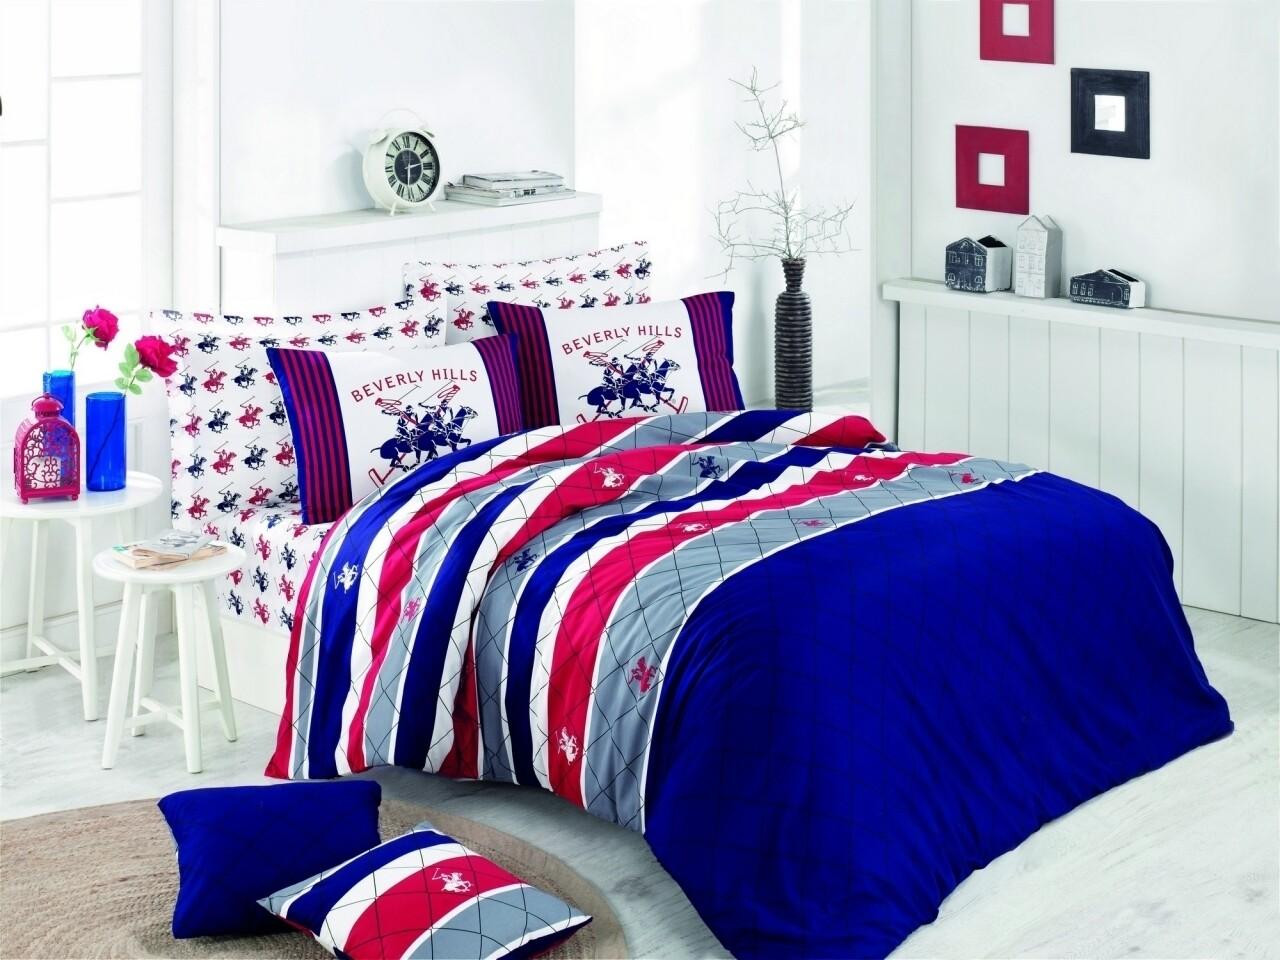 Lenjerie de pat pentru o persoana, Diamonds, Beverly Hills Polo Club, 3 piese, 160 x 240 cm, 100% bumbac ranforce, multicolora